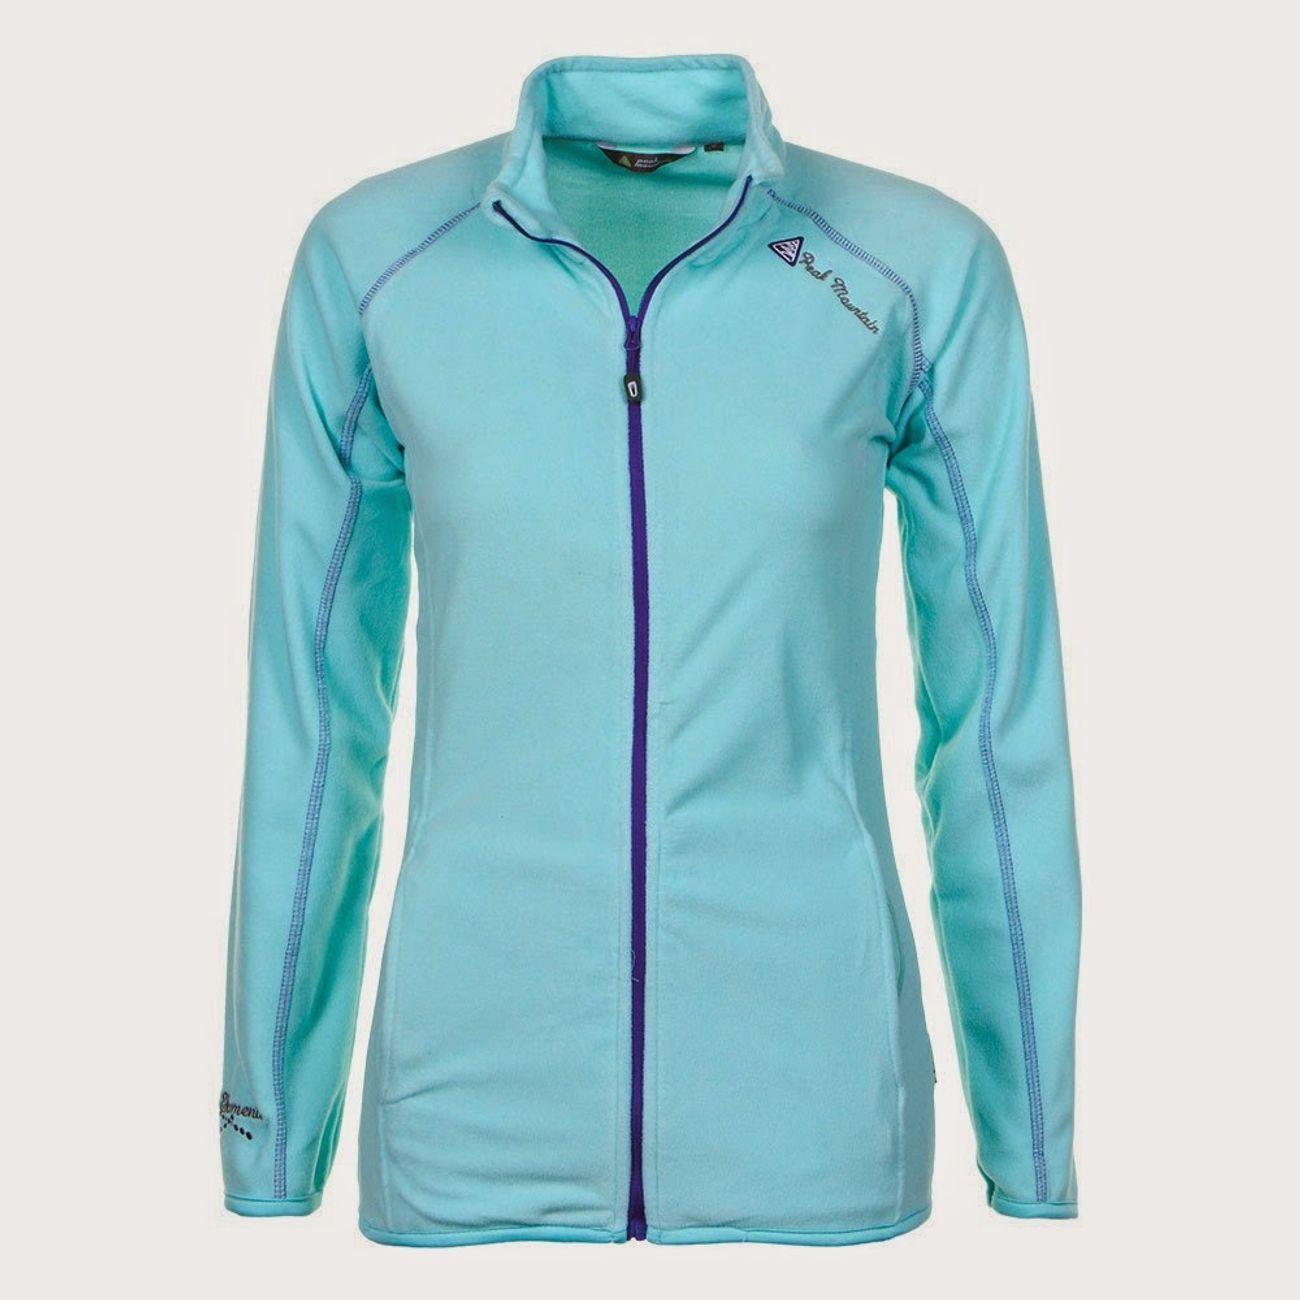 Ski alpin femme PEAK MOUNTAIN Peak Mountain - Sweat polaire femme AFONE-turquoise